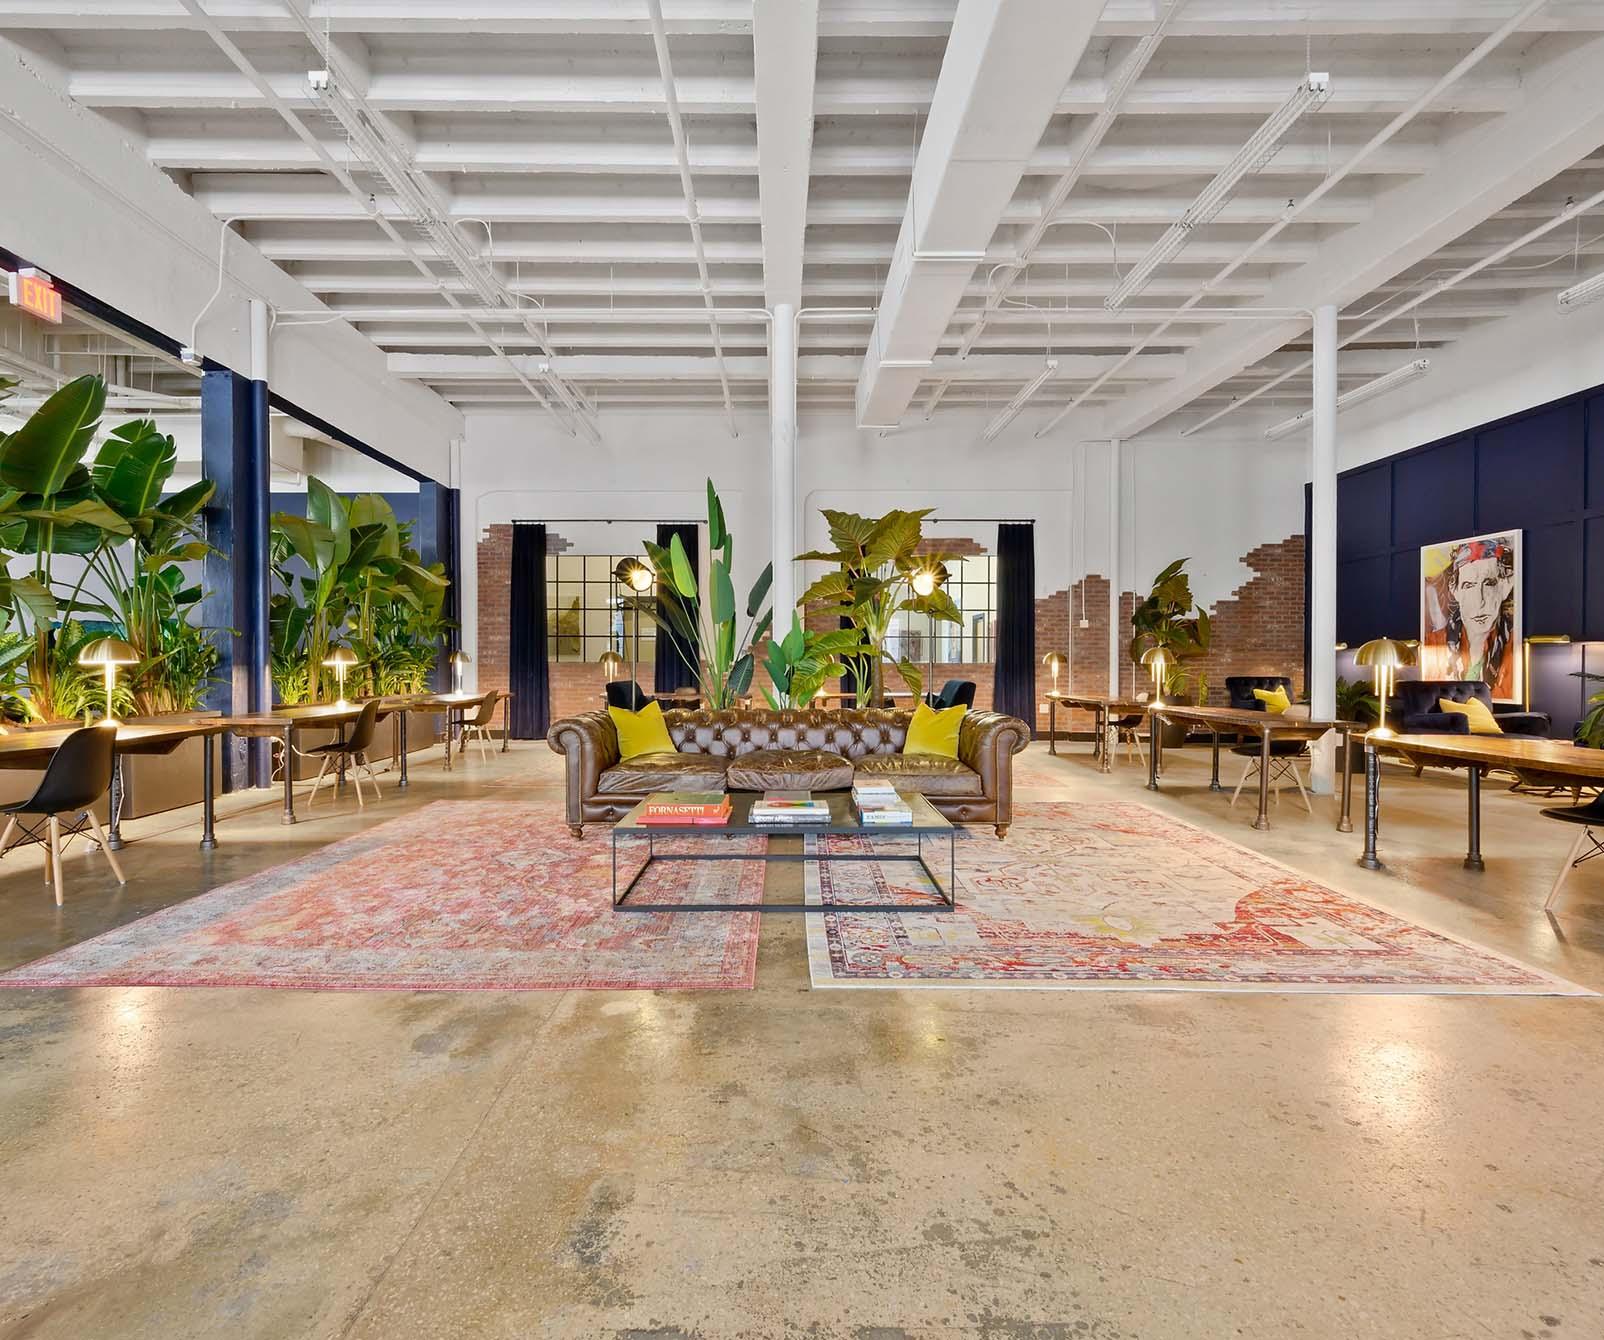 ampersand studios miami coworking space and creative studios